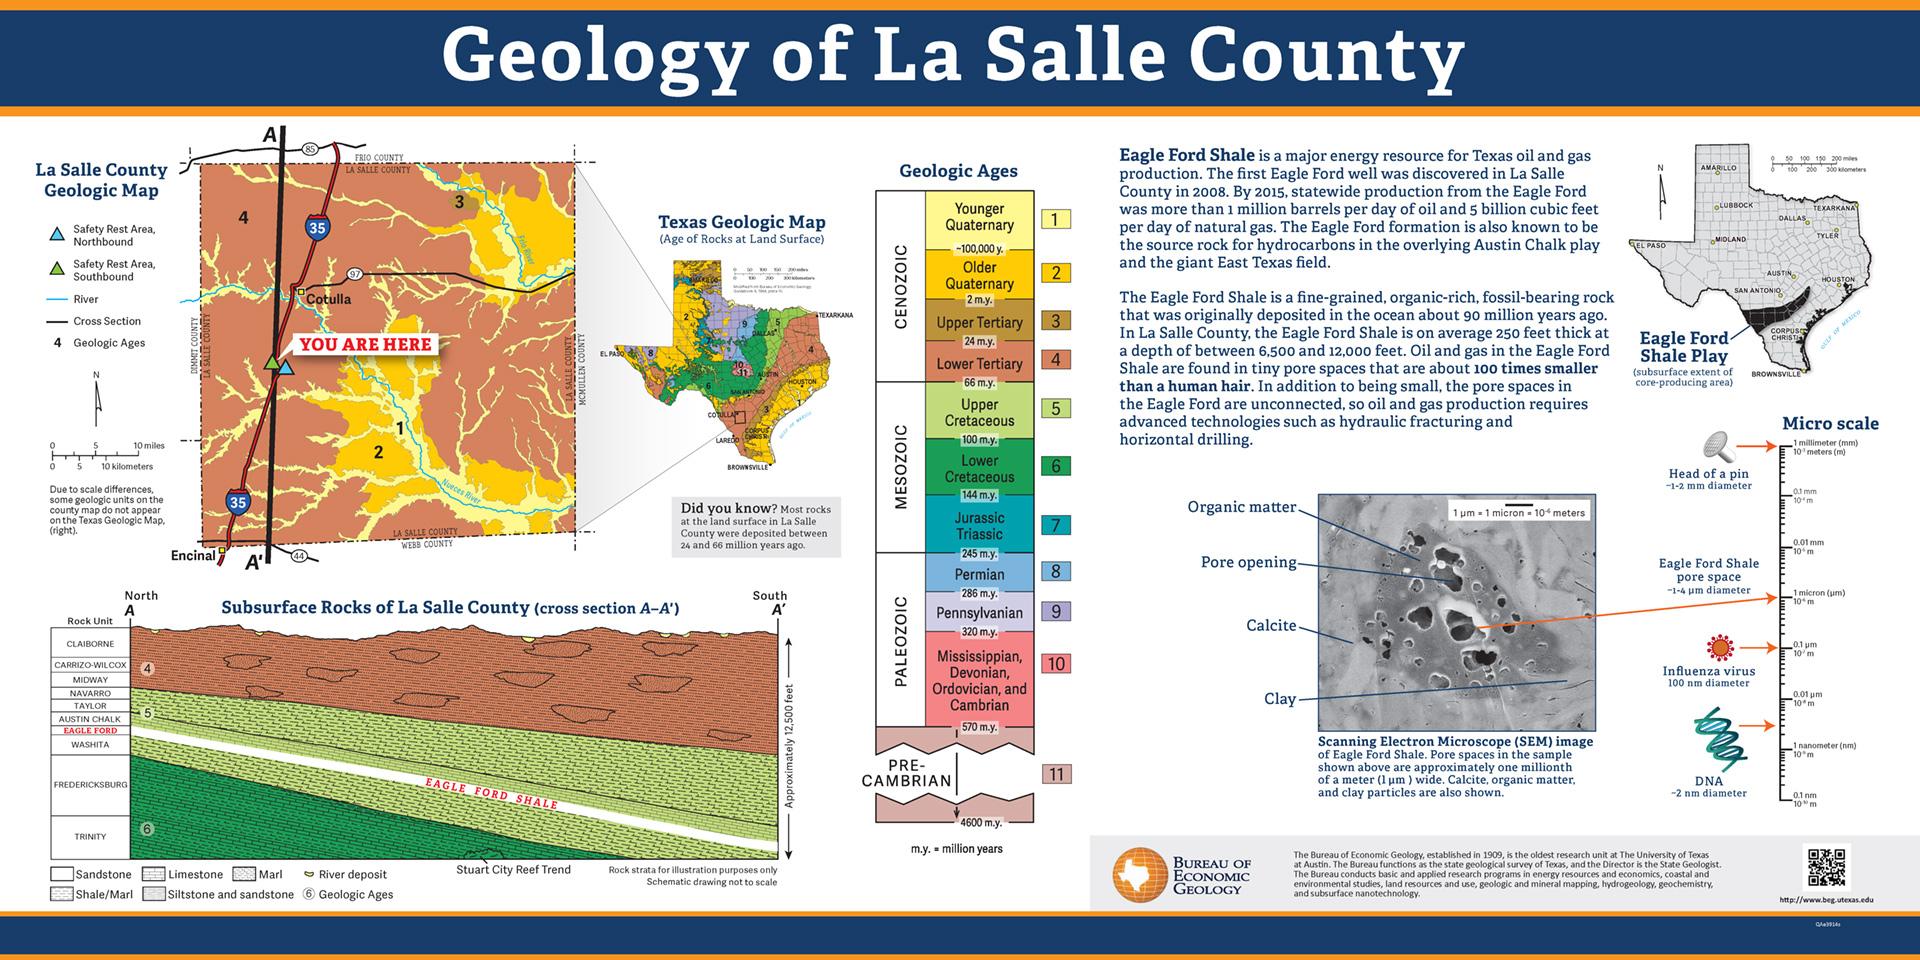 Texas GeoSign Project | Bureau of Economic Geology